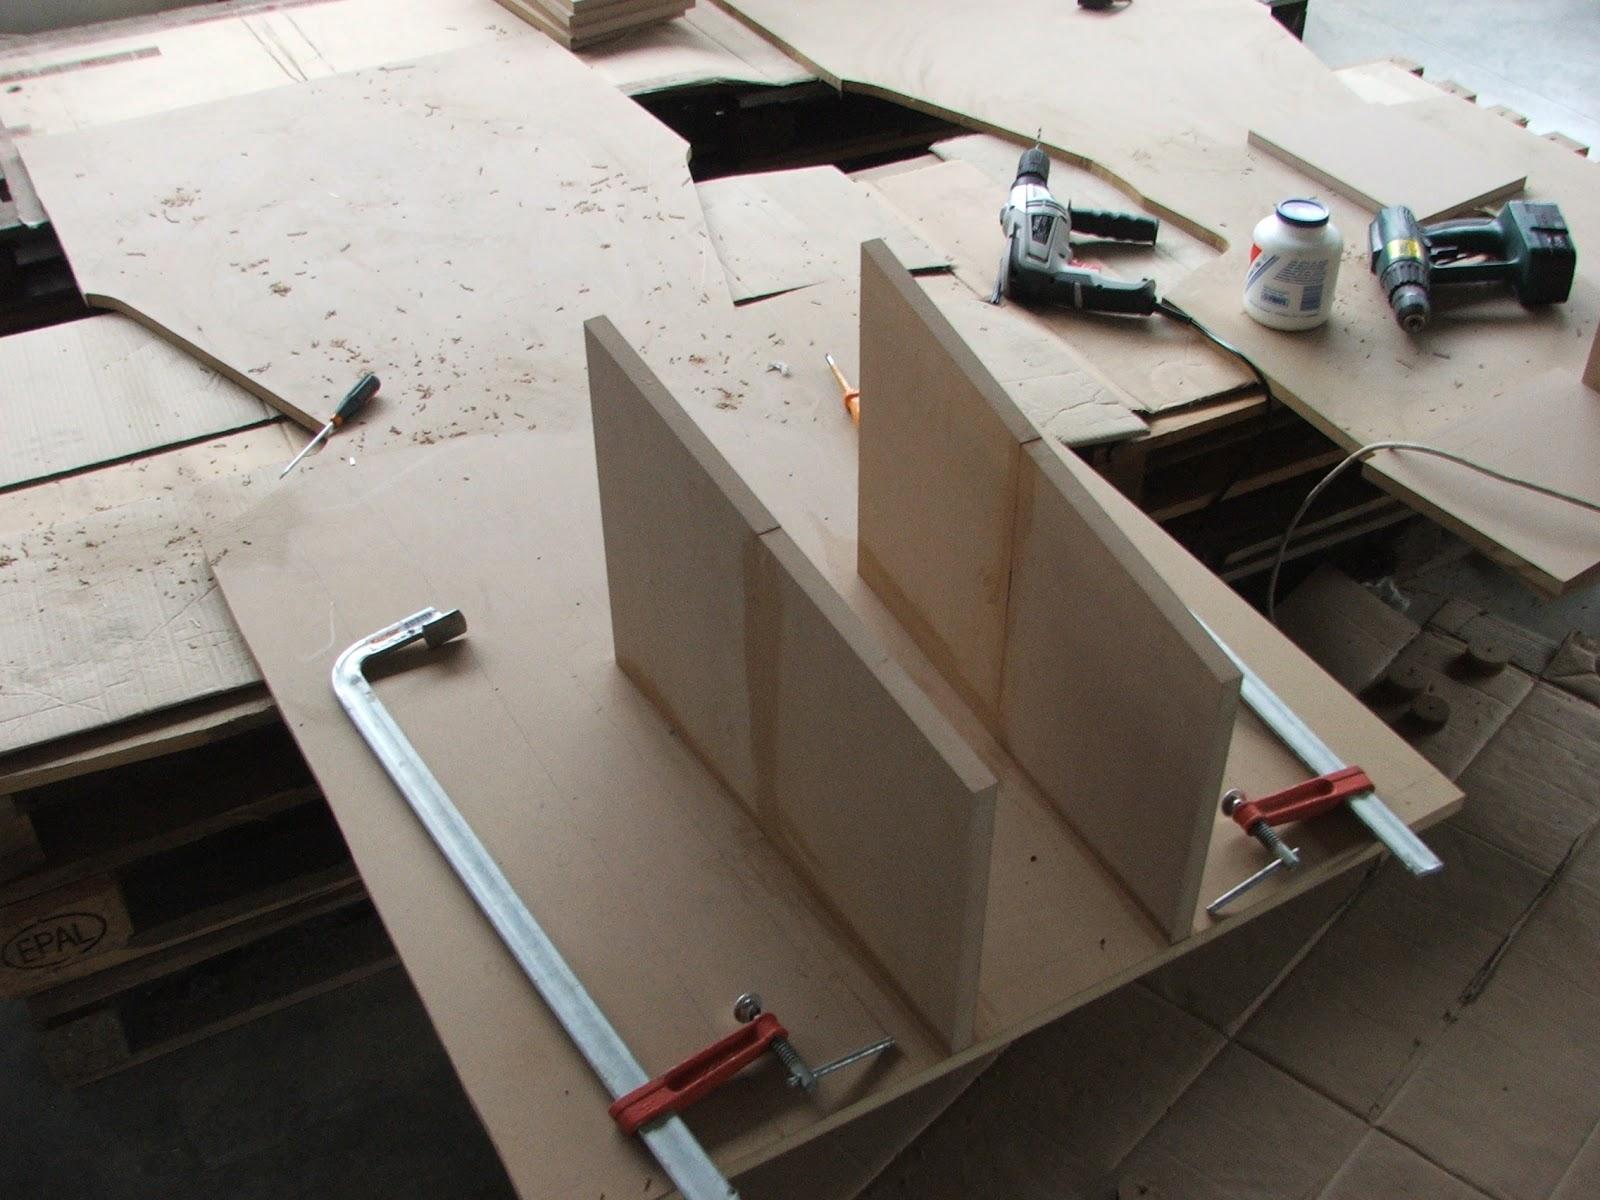 doityourselfaudio 40 hz bass horn. Black Bedroom Furniture Sets. Home Design Ideas